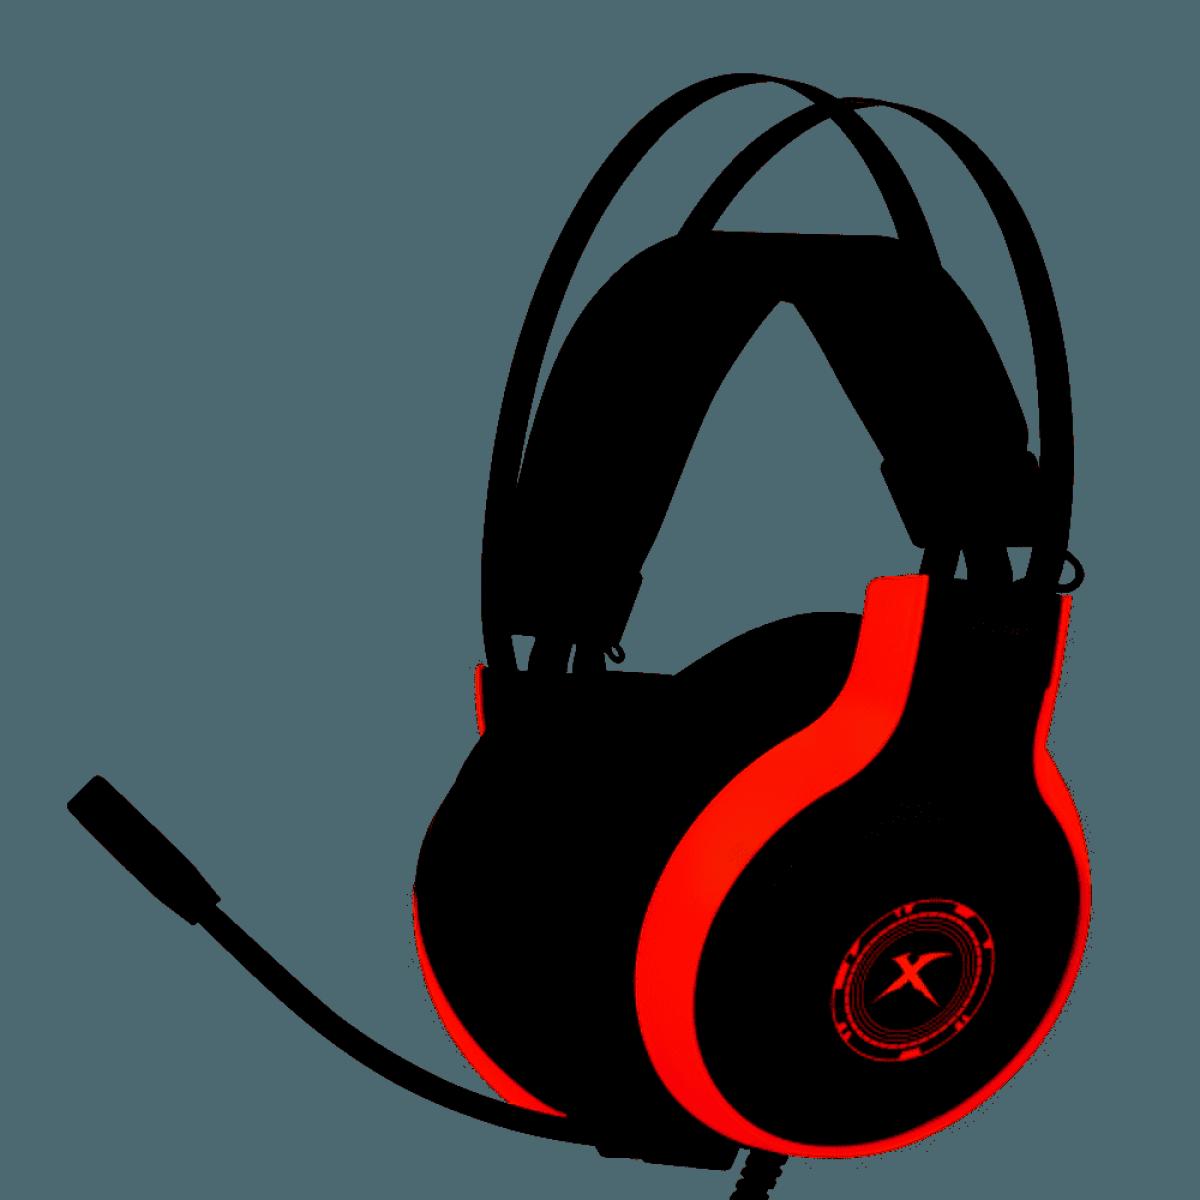 Headset Gamer Xtrike-me GH-908, 7.1, 3.5mm x 2 + USB, PC/PS4/Xbox One, GH-908